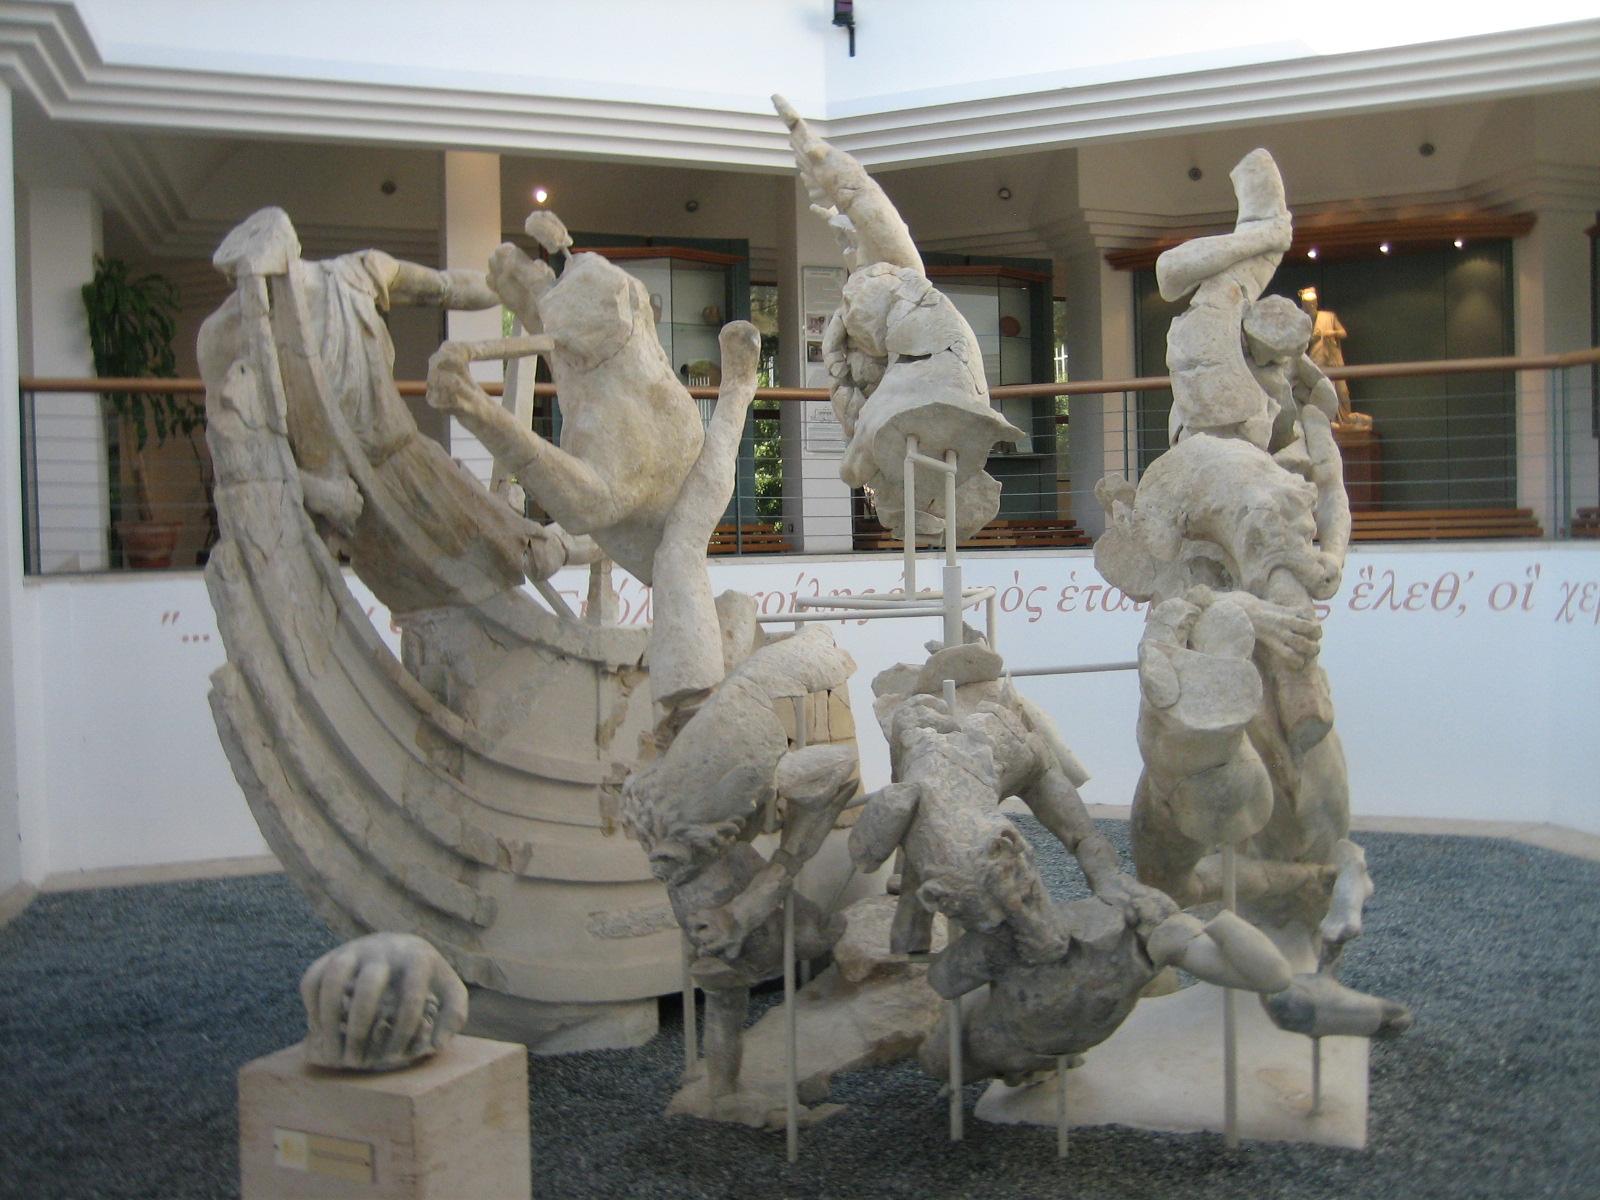 "Späthellenistische Statuengruppe (Ende 1. Jh. v. Chr.) aus der Villa von Sperlonga. Marmor. Museo Archaelogico di Sperlonga.<br>Quelle: <a href=""https://www.flickr.com/photos/8057065@N04/4607282594"">steveilott / Flickr</a><br> Lizenz: <a href=""https://creativecommons.org/licenses/by/2.0/"">Creative Commons BY 2.0</a>"